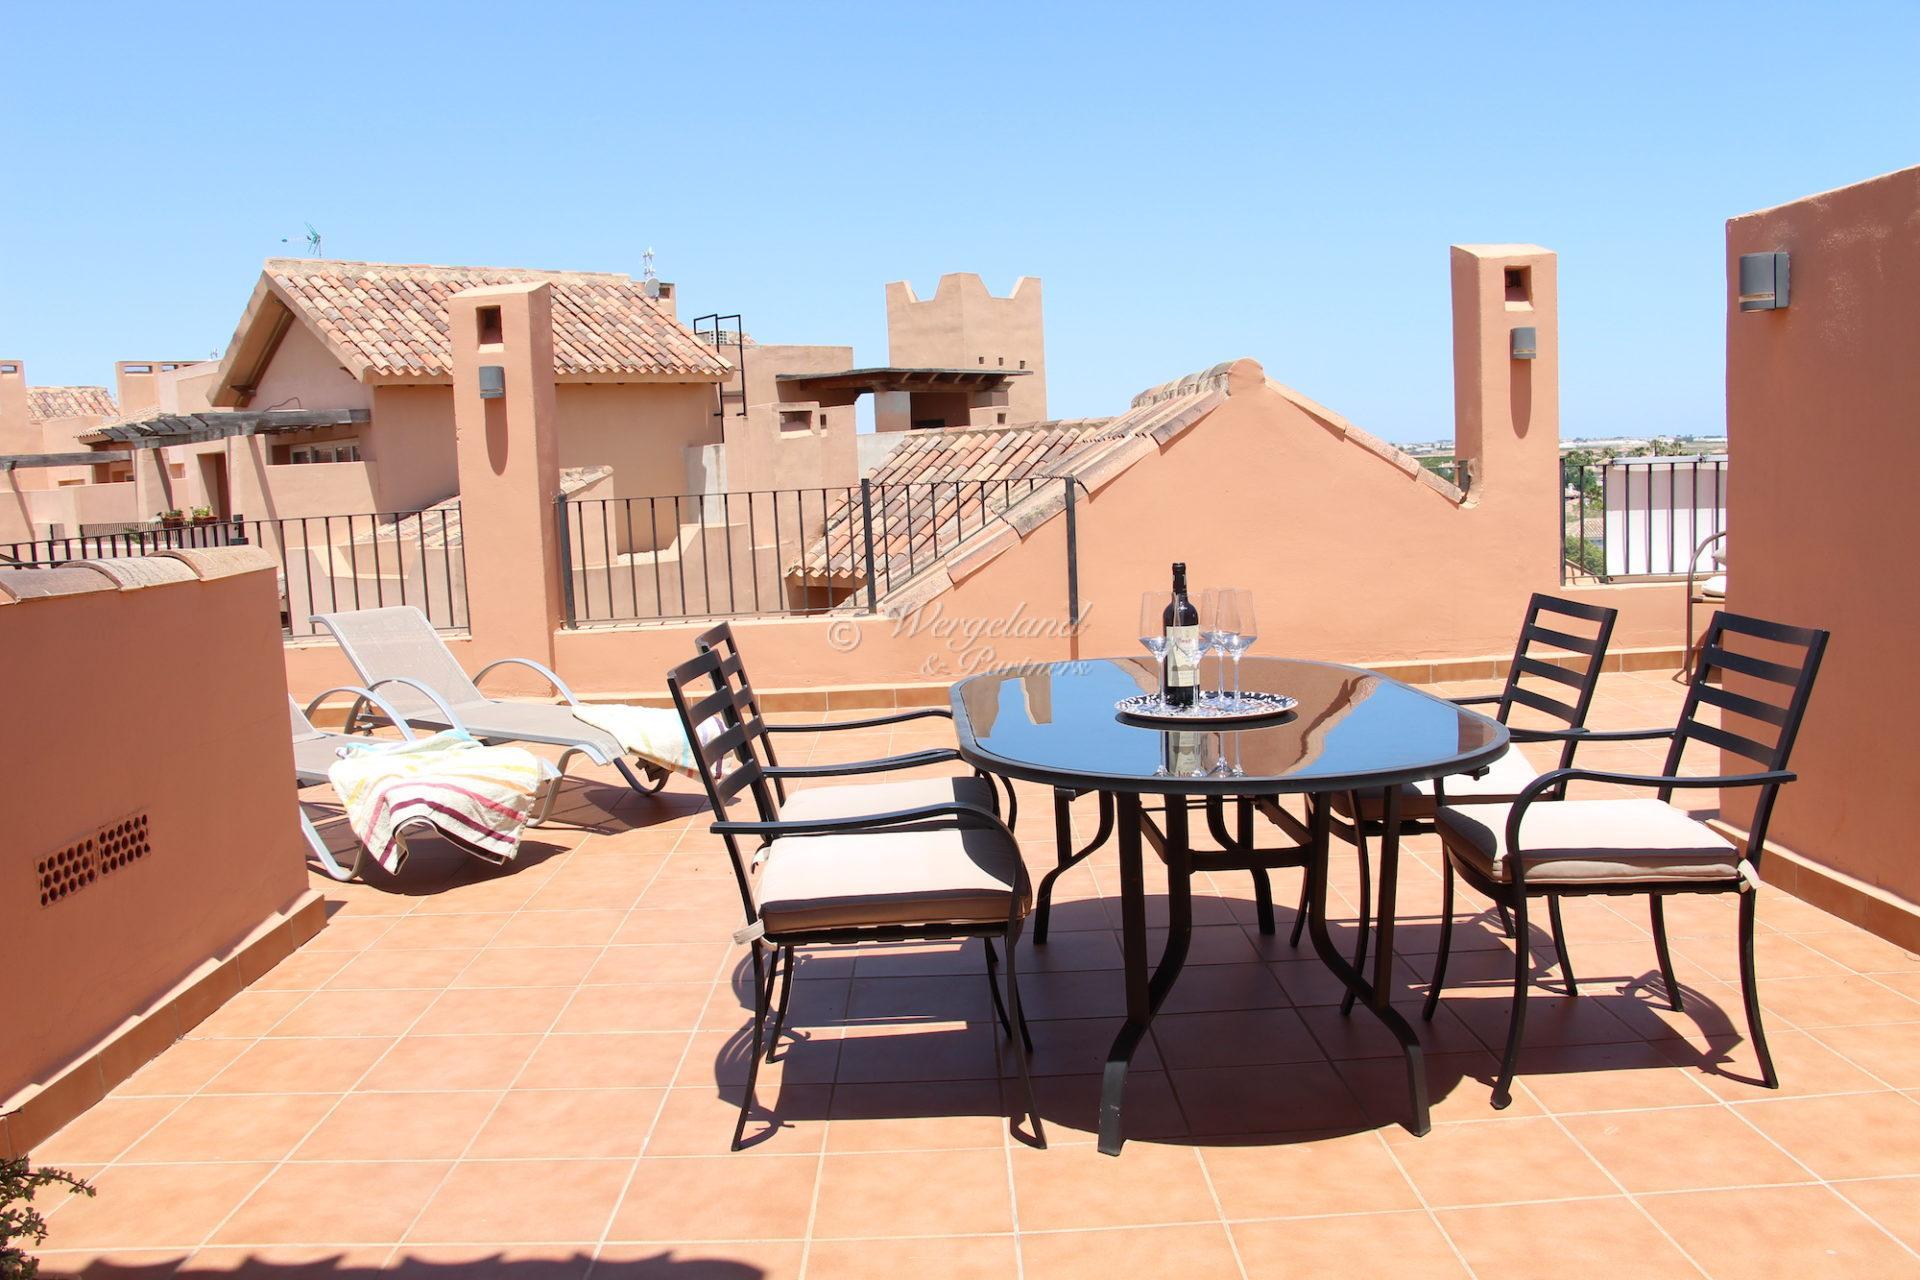 Penthouse ved rangen. 72 m2 terrasser med sol fra morgen til kveld. Møblert [14031]